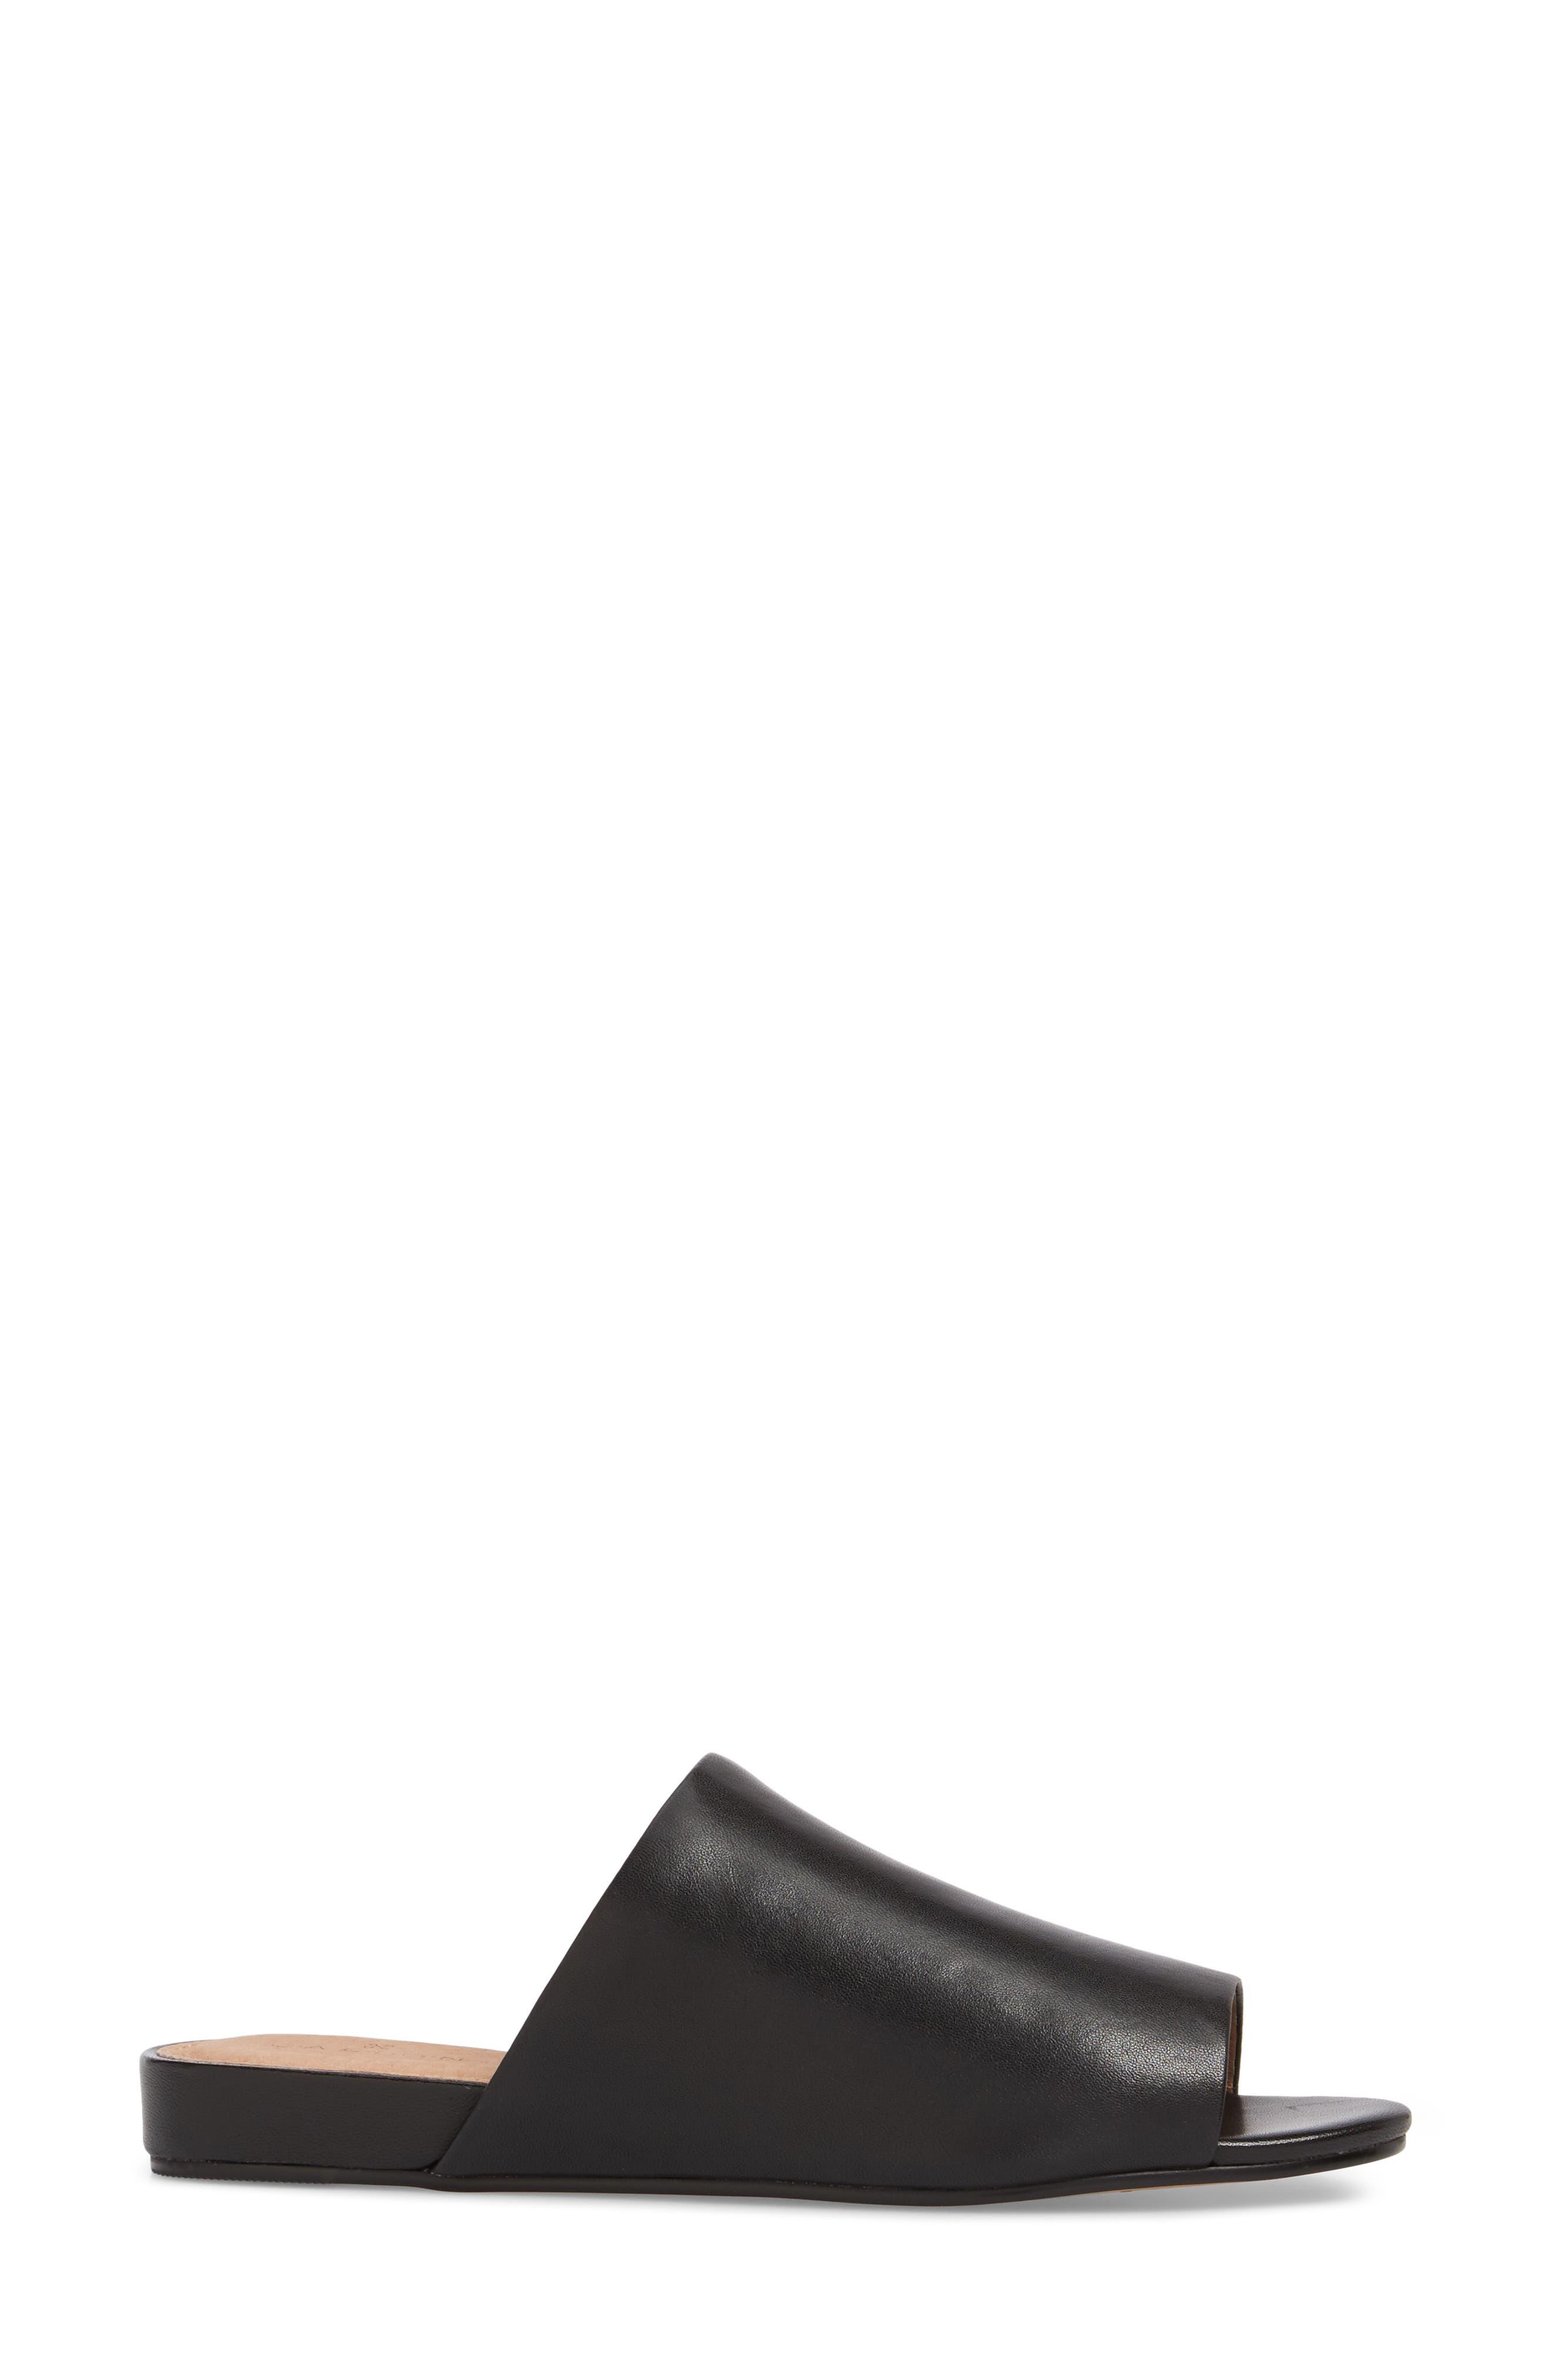 Kiana Slide Sandal,                             Alternate thumbnail 3, color,                             001